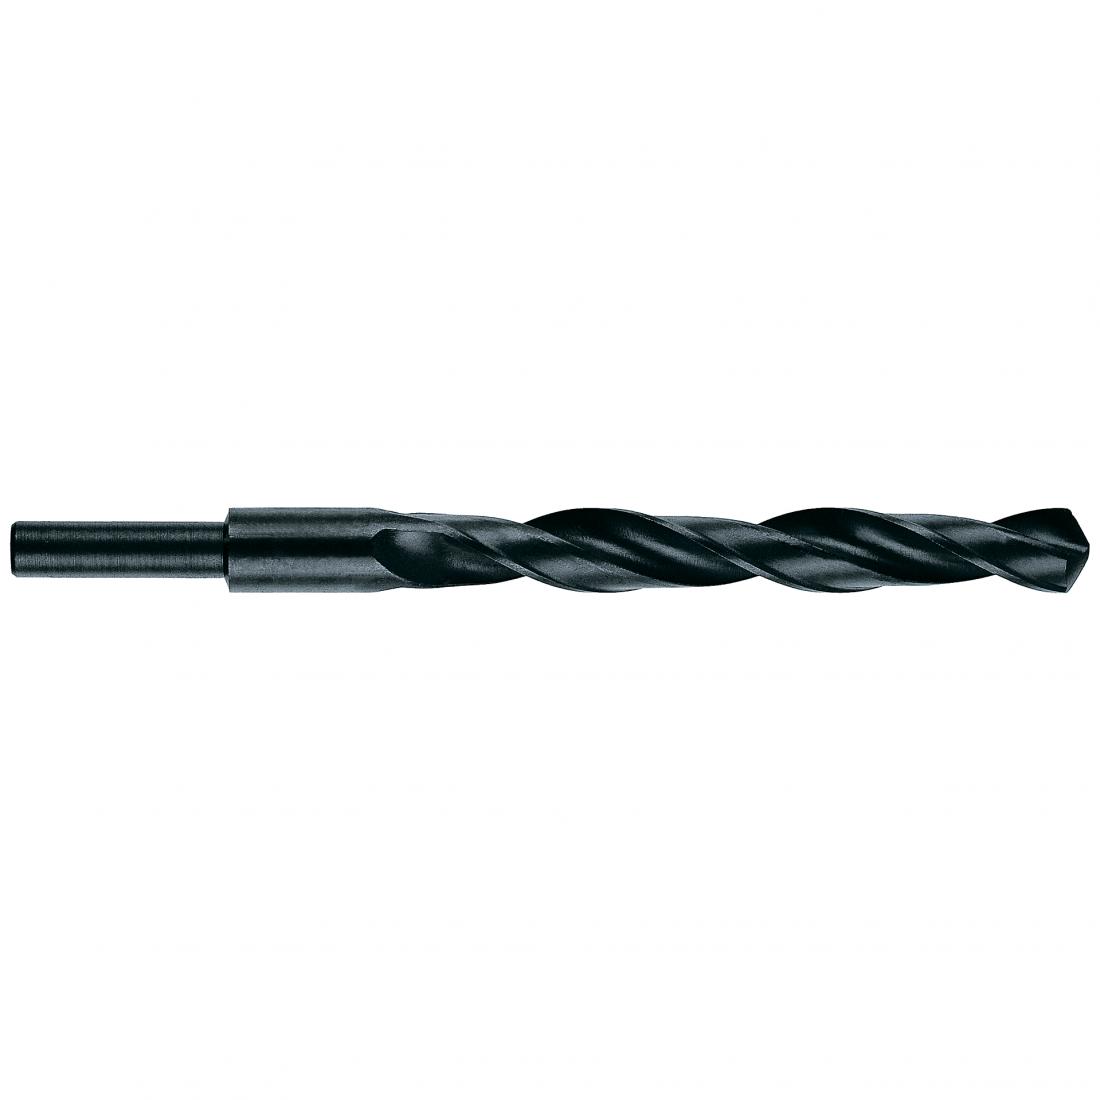 Сверло по металлу Heller HSS cо ступенчатым хвостовиком 15,5х120х178мм